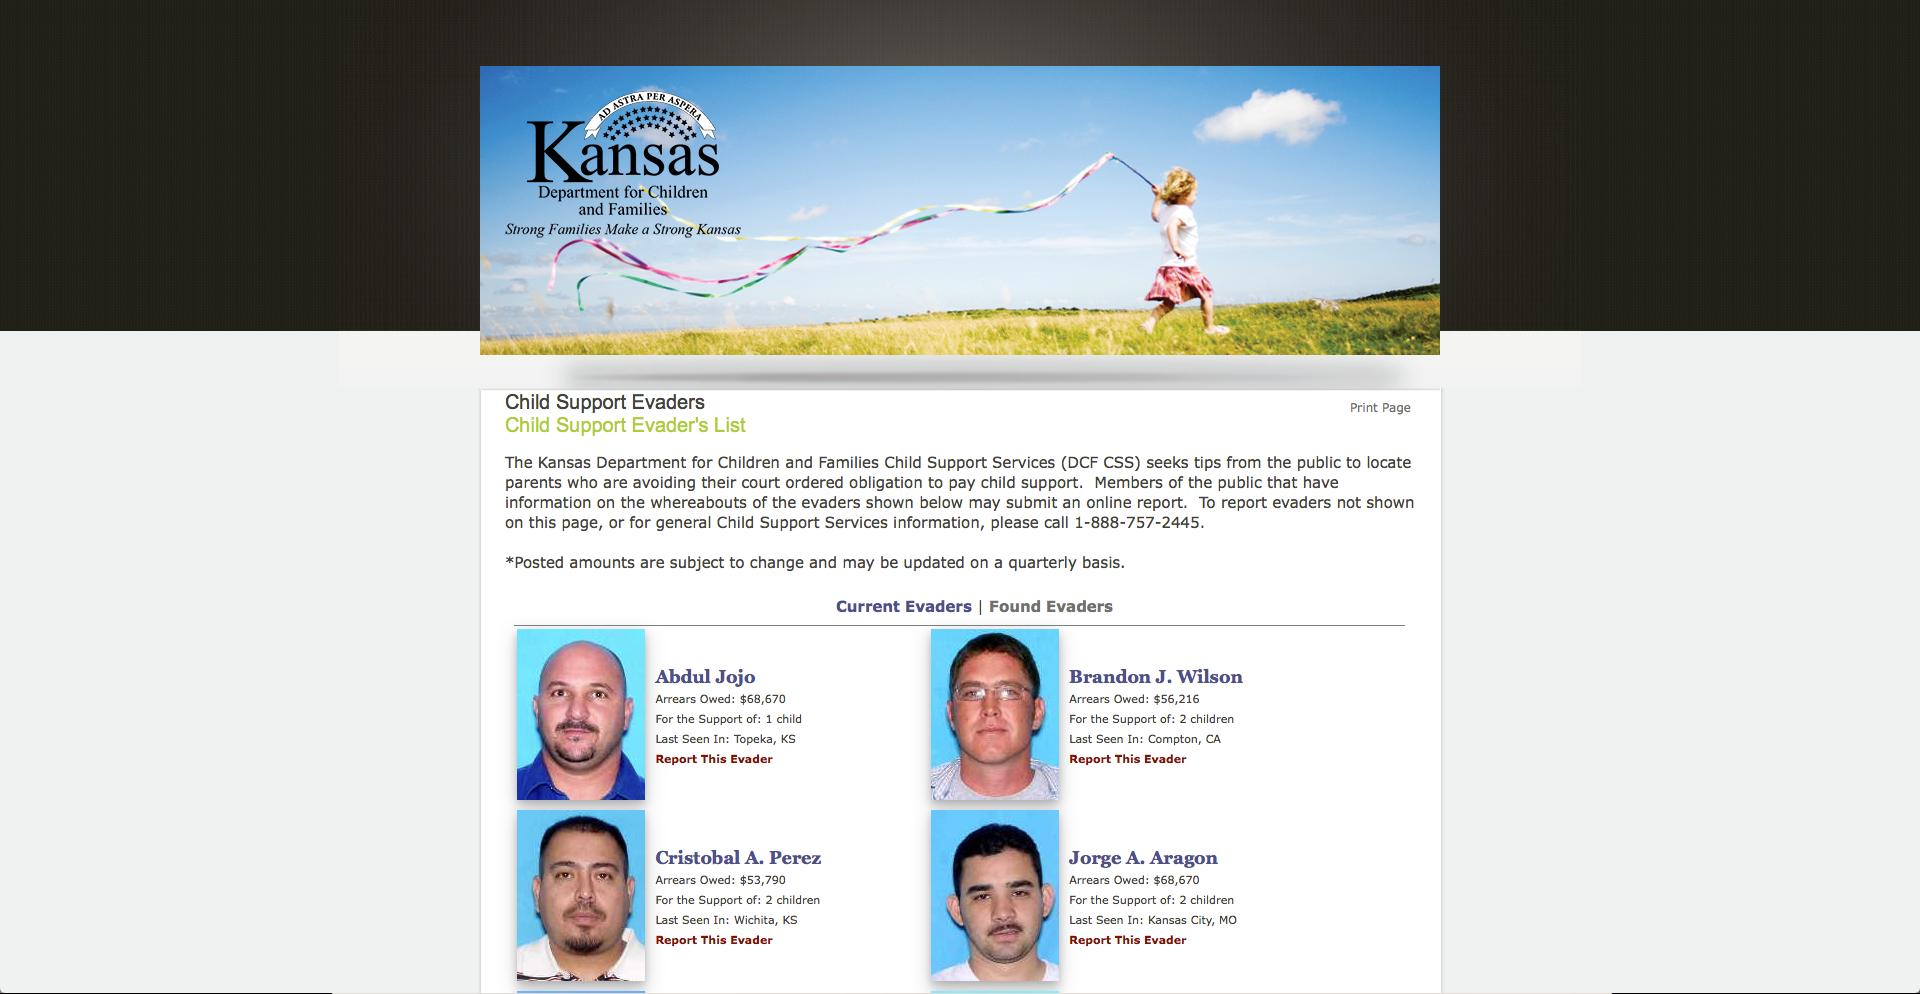 Kansas posting mug shots of child support 'evaders'